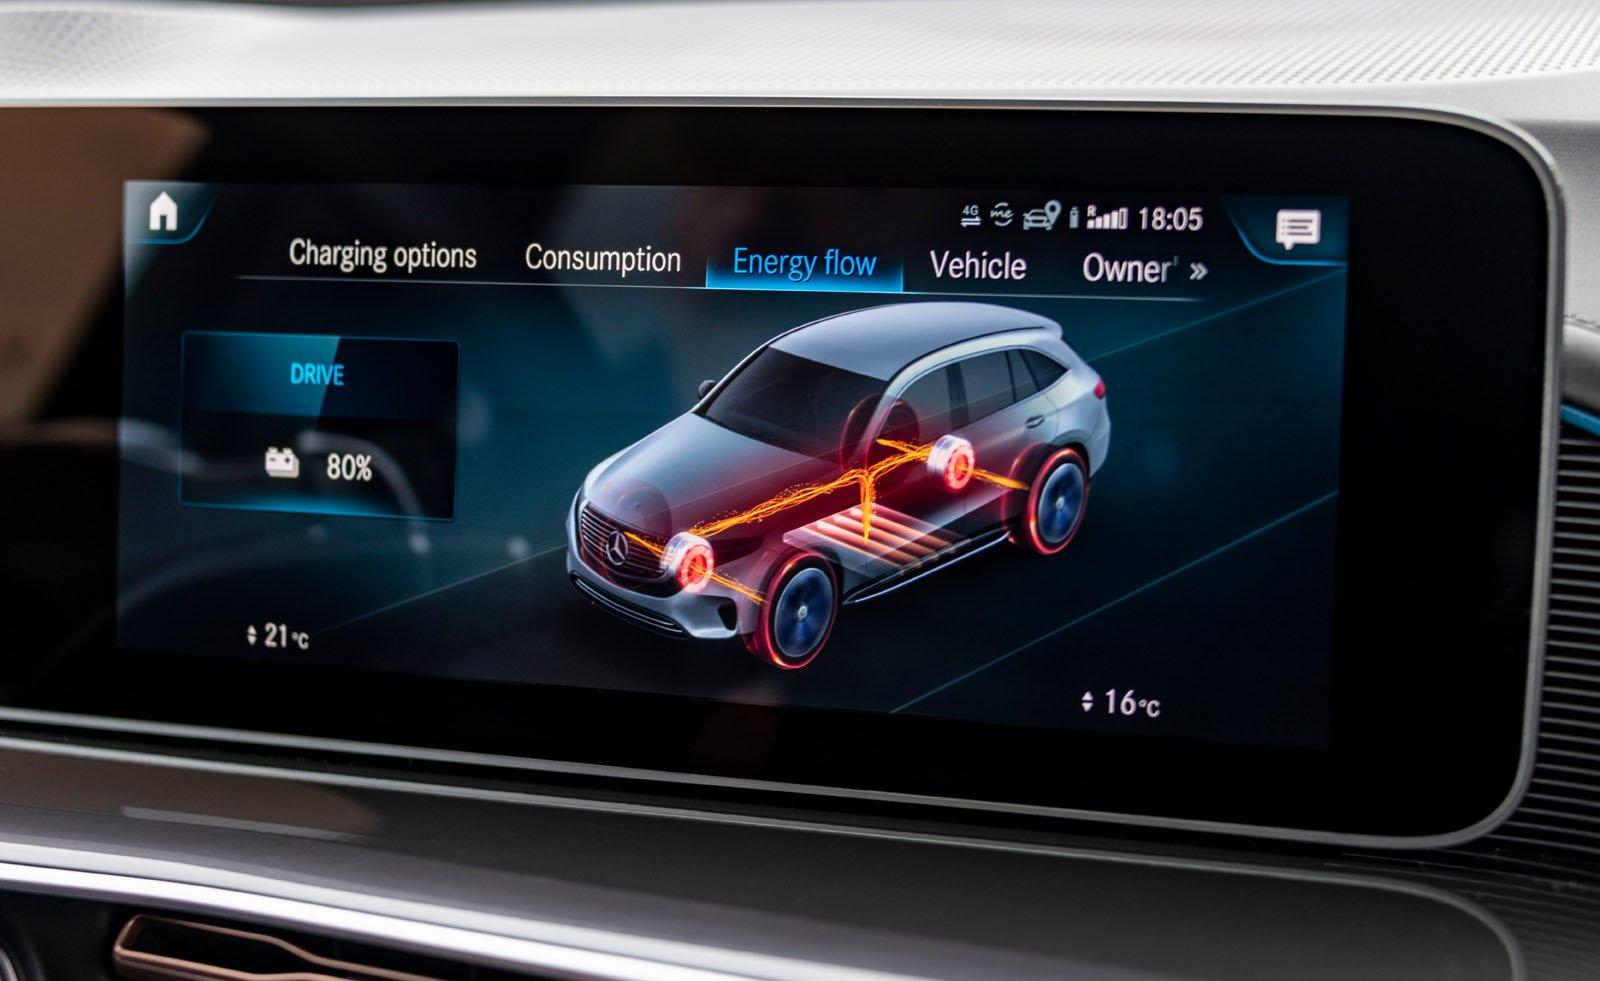 Mercedes EQC 2019 LHD infotainment